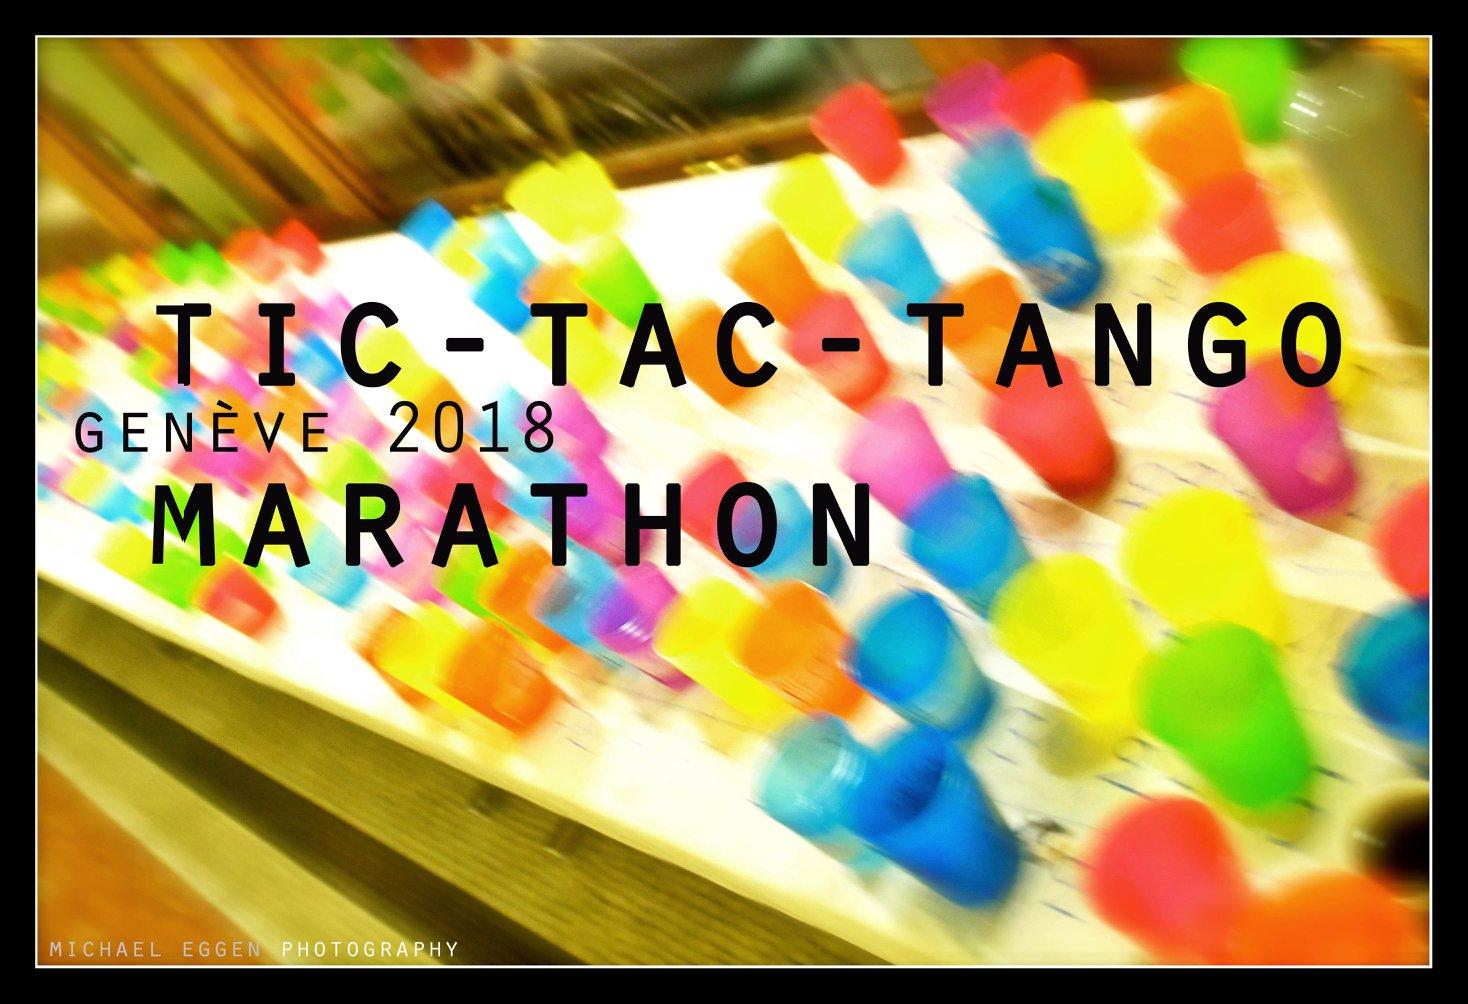 Tic-Tac-Tango-Time Geneva Tango